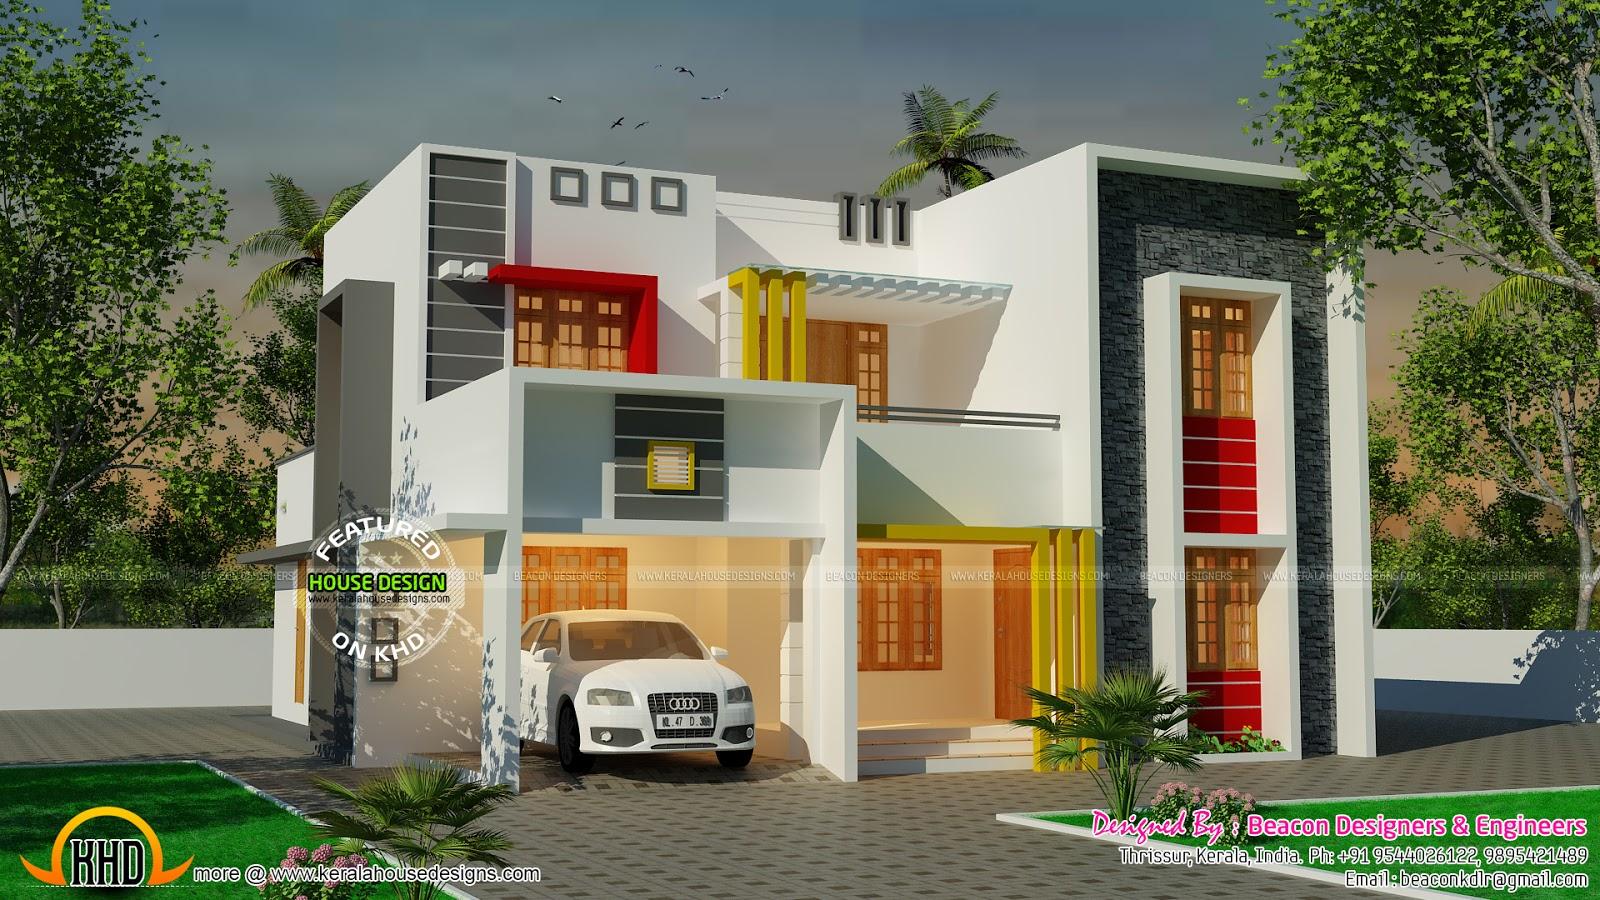 Beautiful modern flat roof house kerala home design and for Flat roof house designs kerala